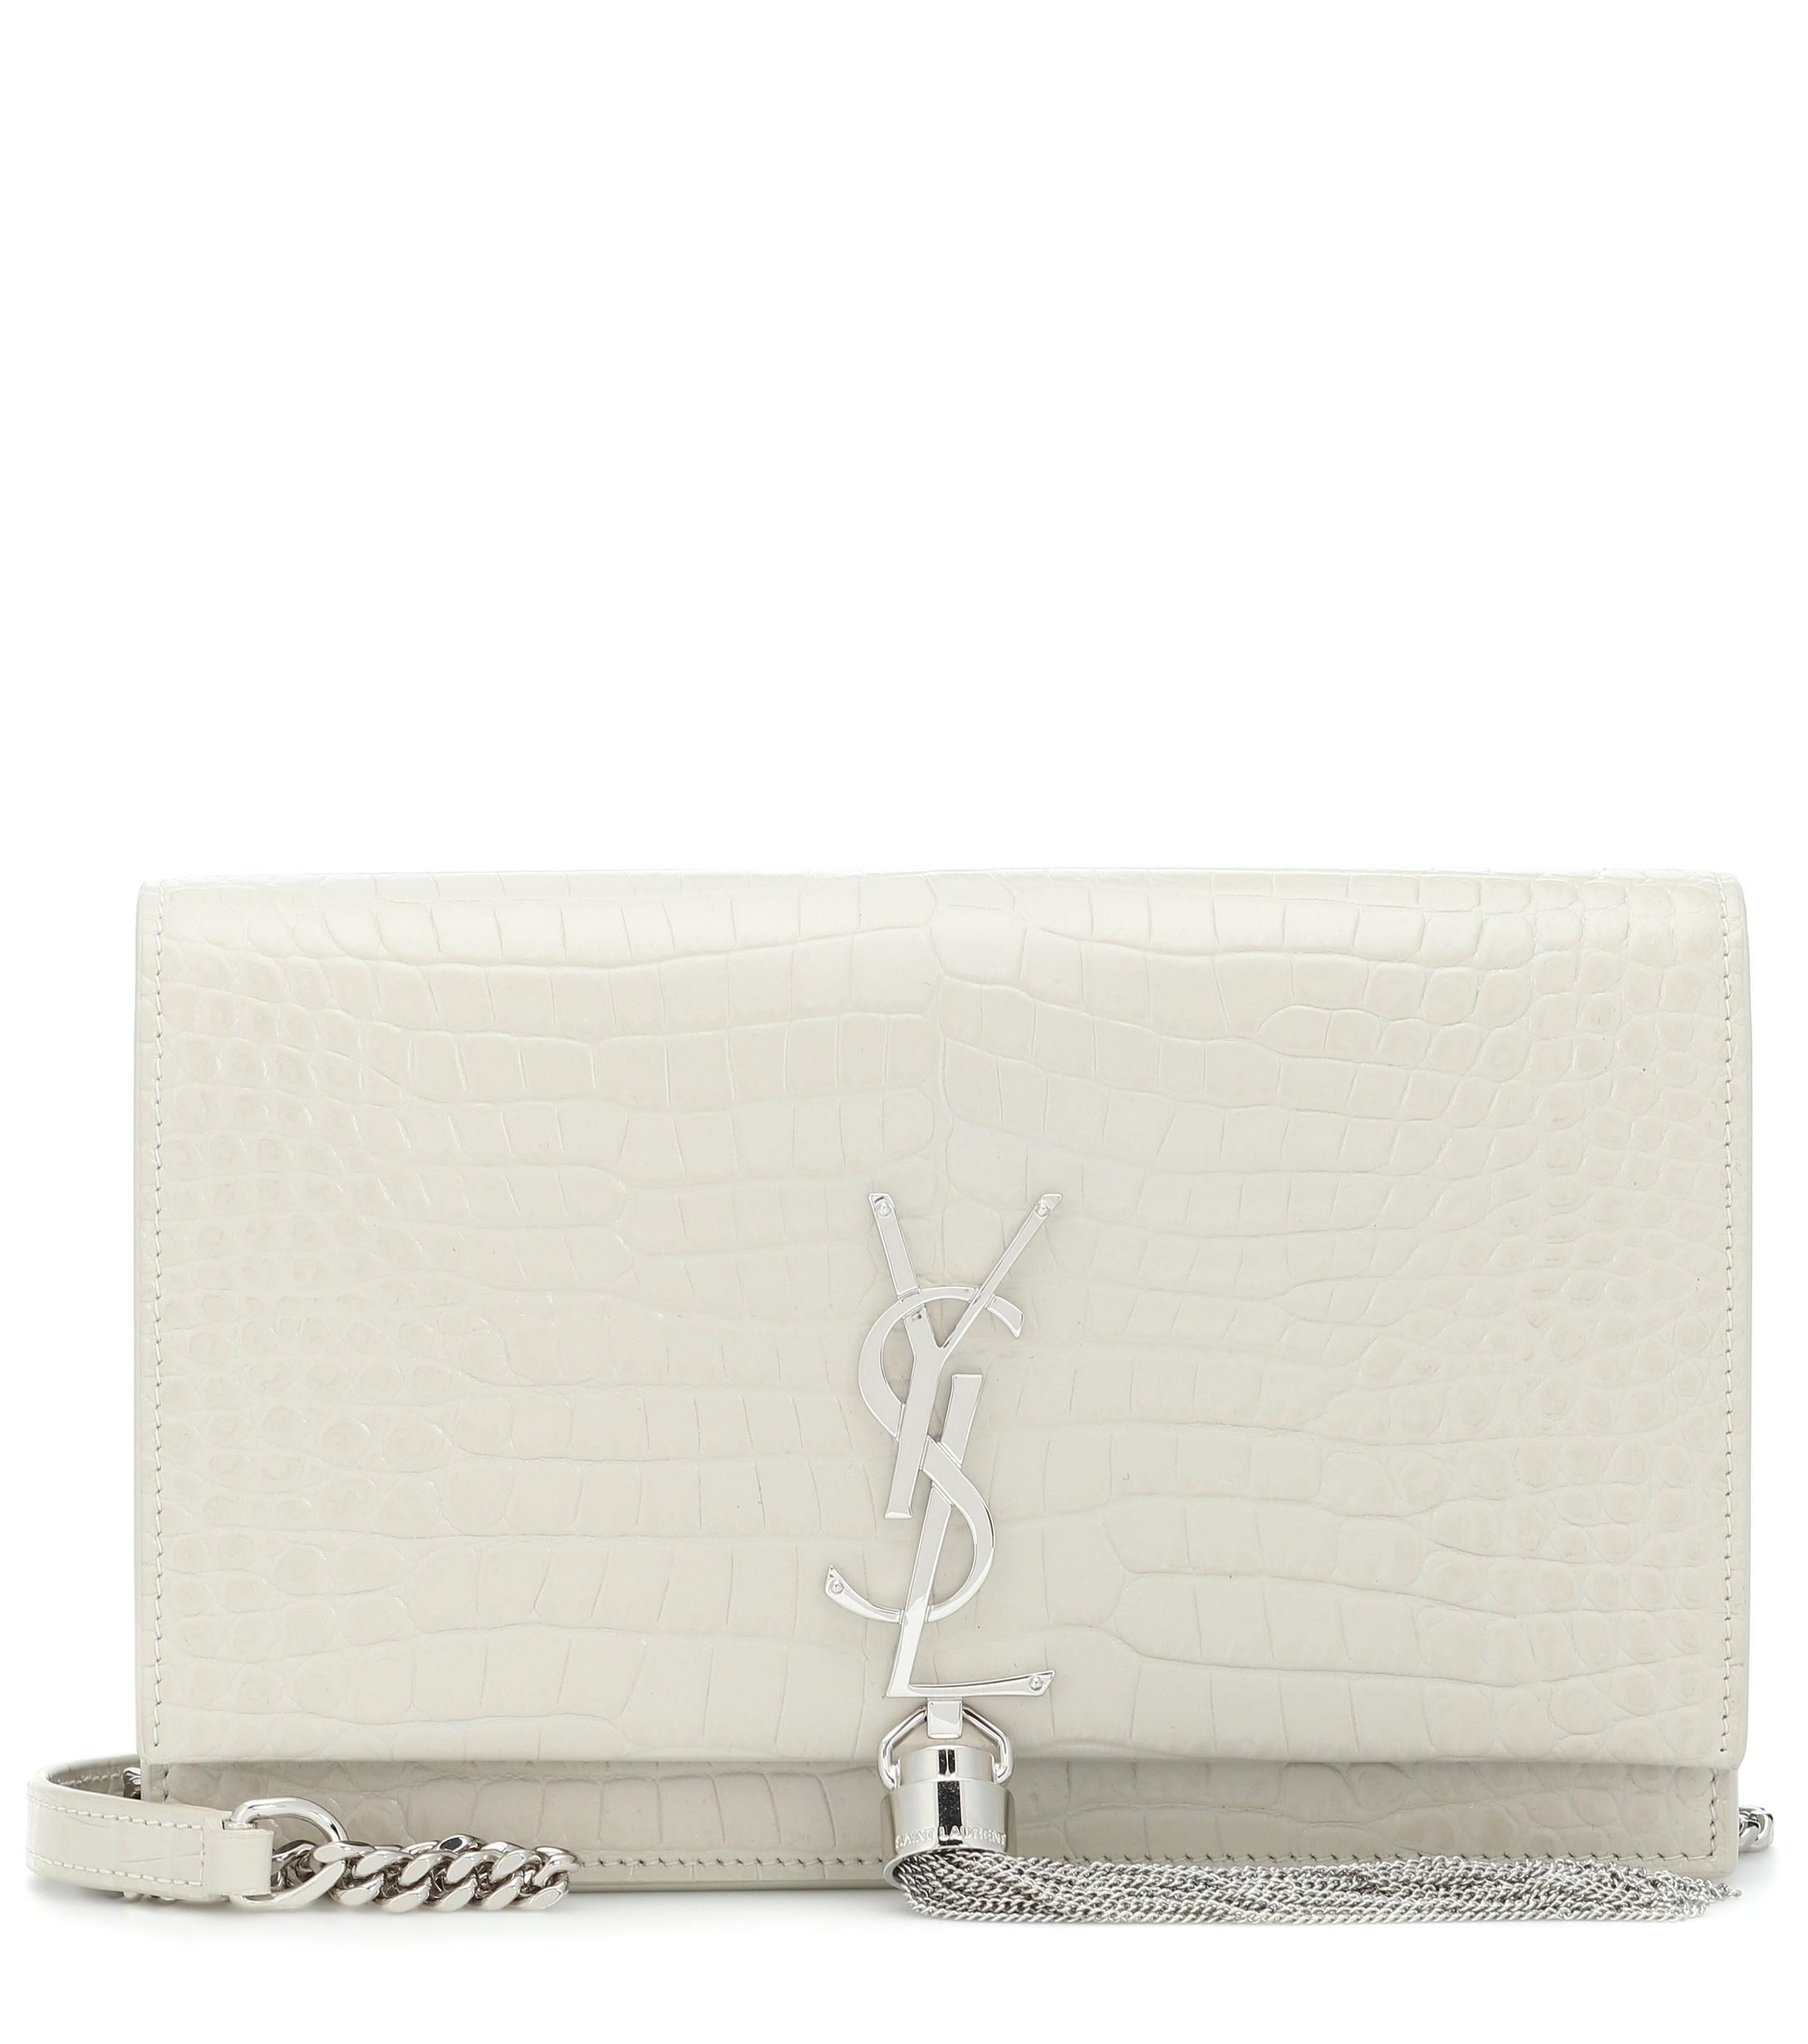 865299d797 Saint Laurent Kate Tassel Leather Shoulder Bag in White - Lyst